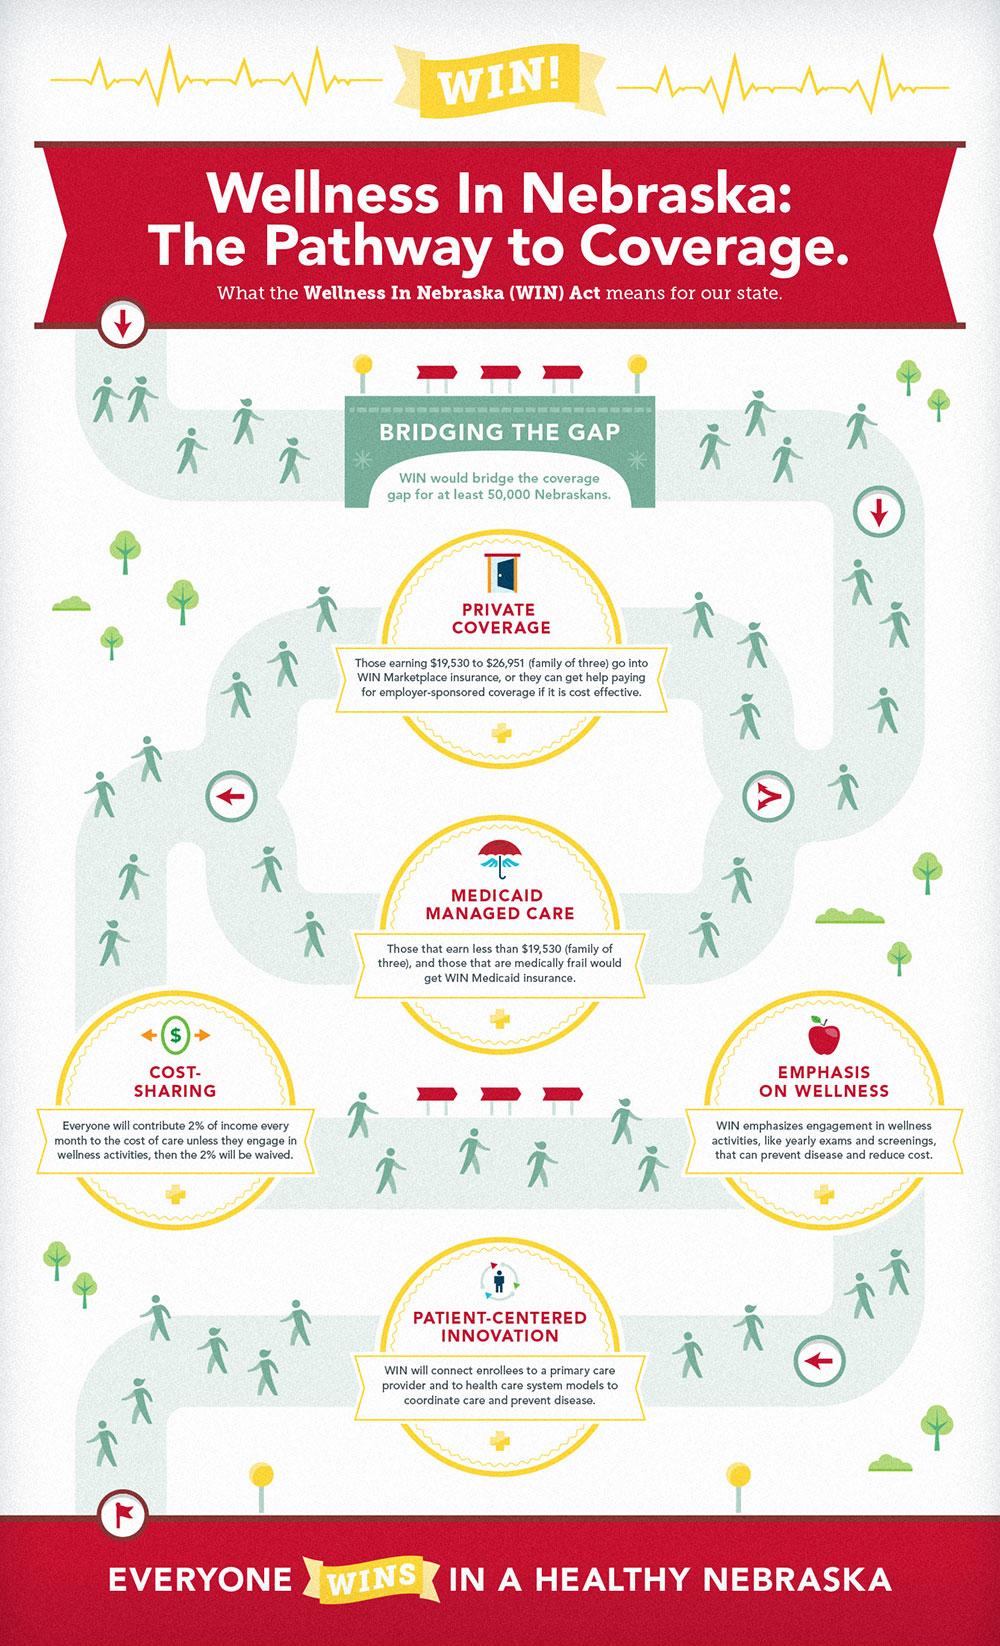 jkdc_appleseed-win_infographic_sm.jpg